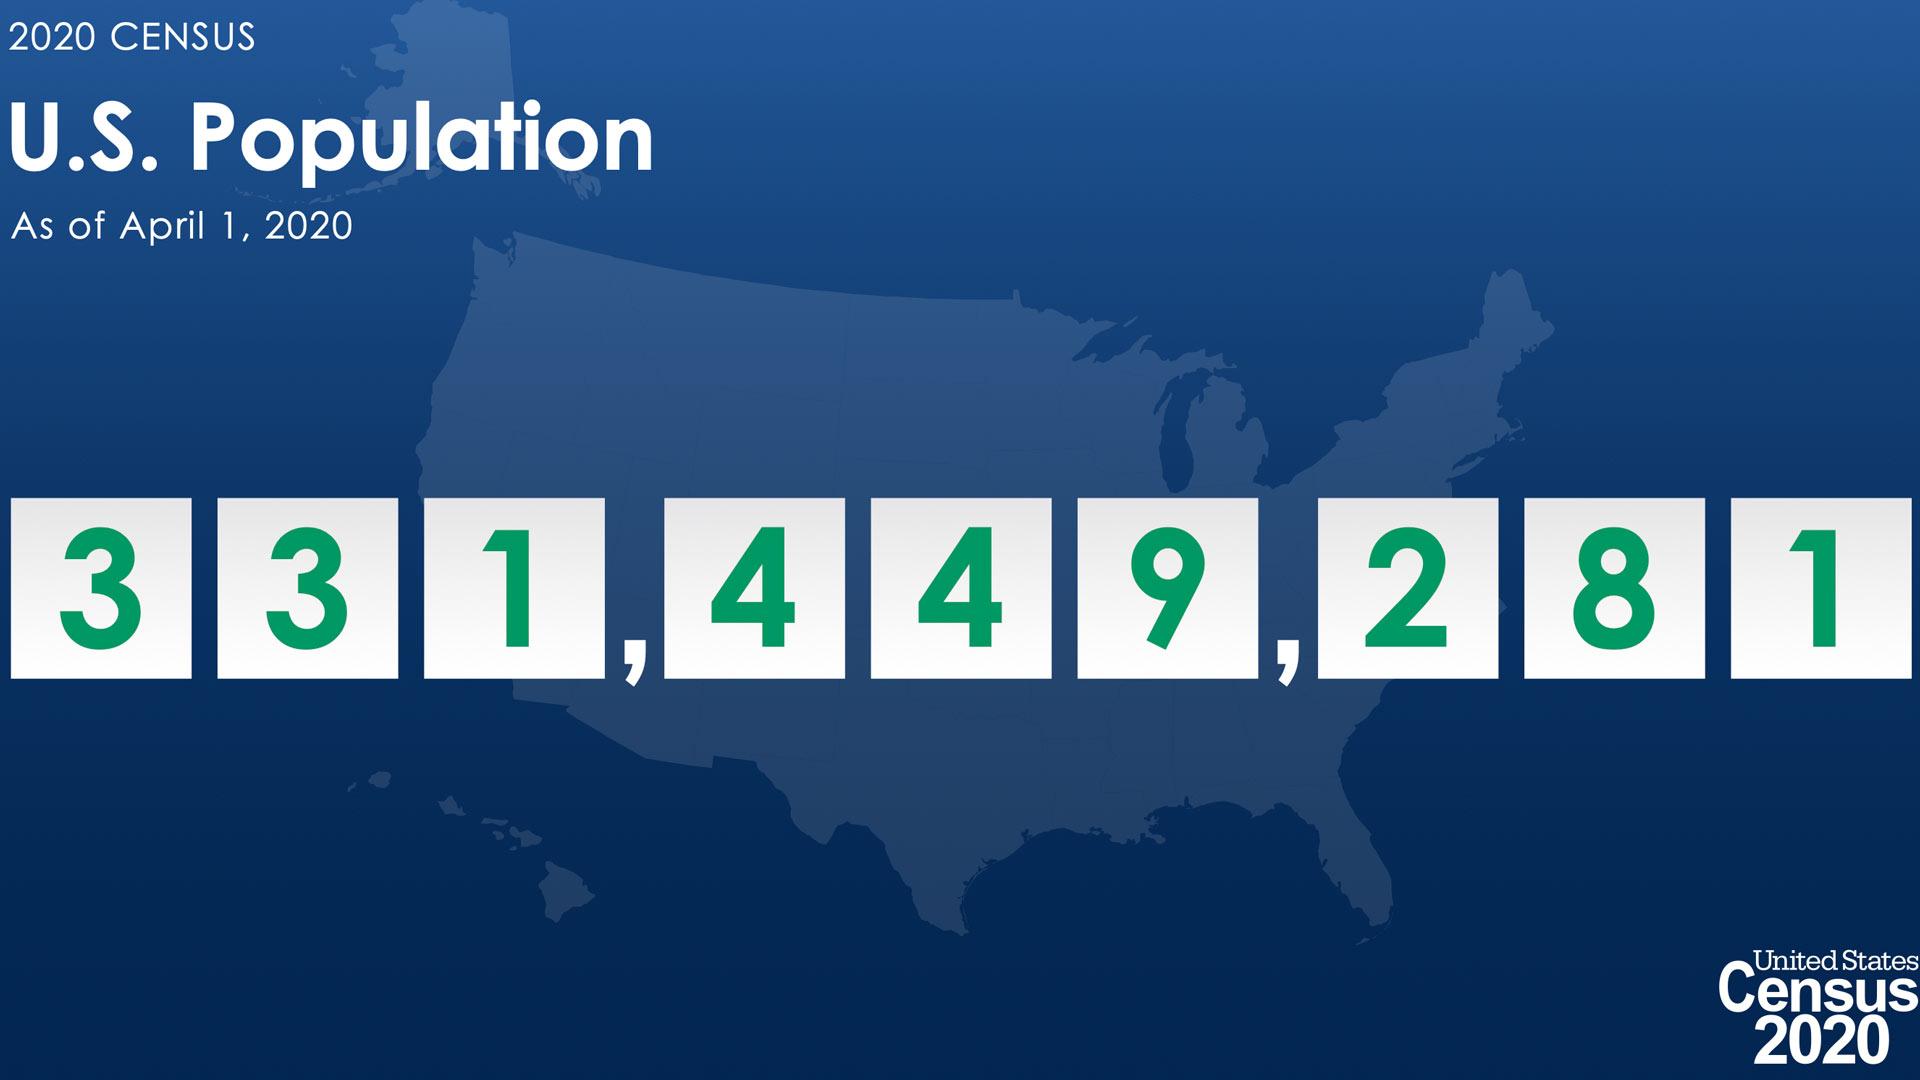 The U.S. population as of April 1, 2020, according to the U.S. Census Bureau.